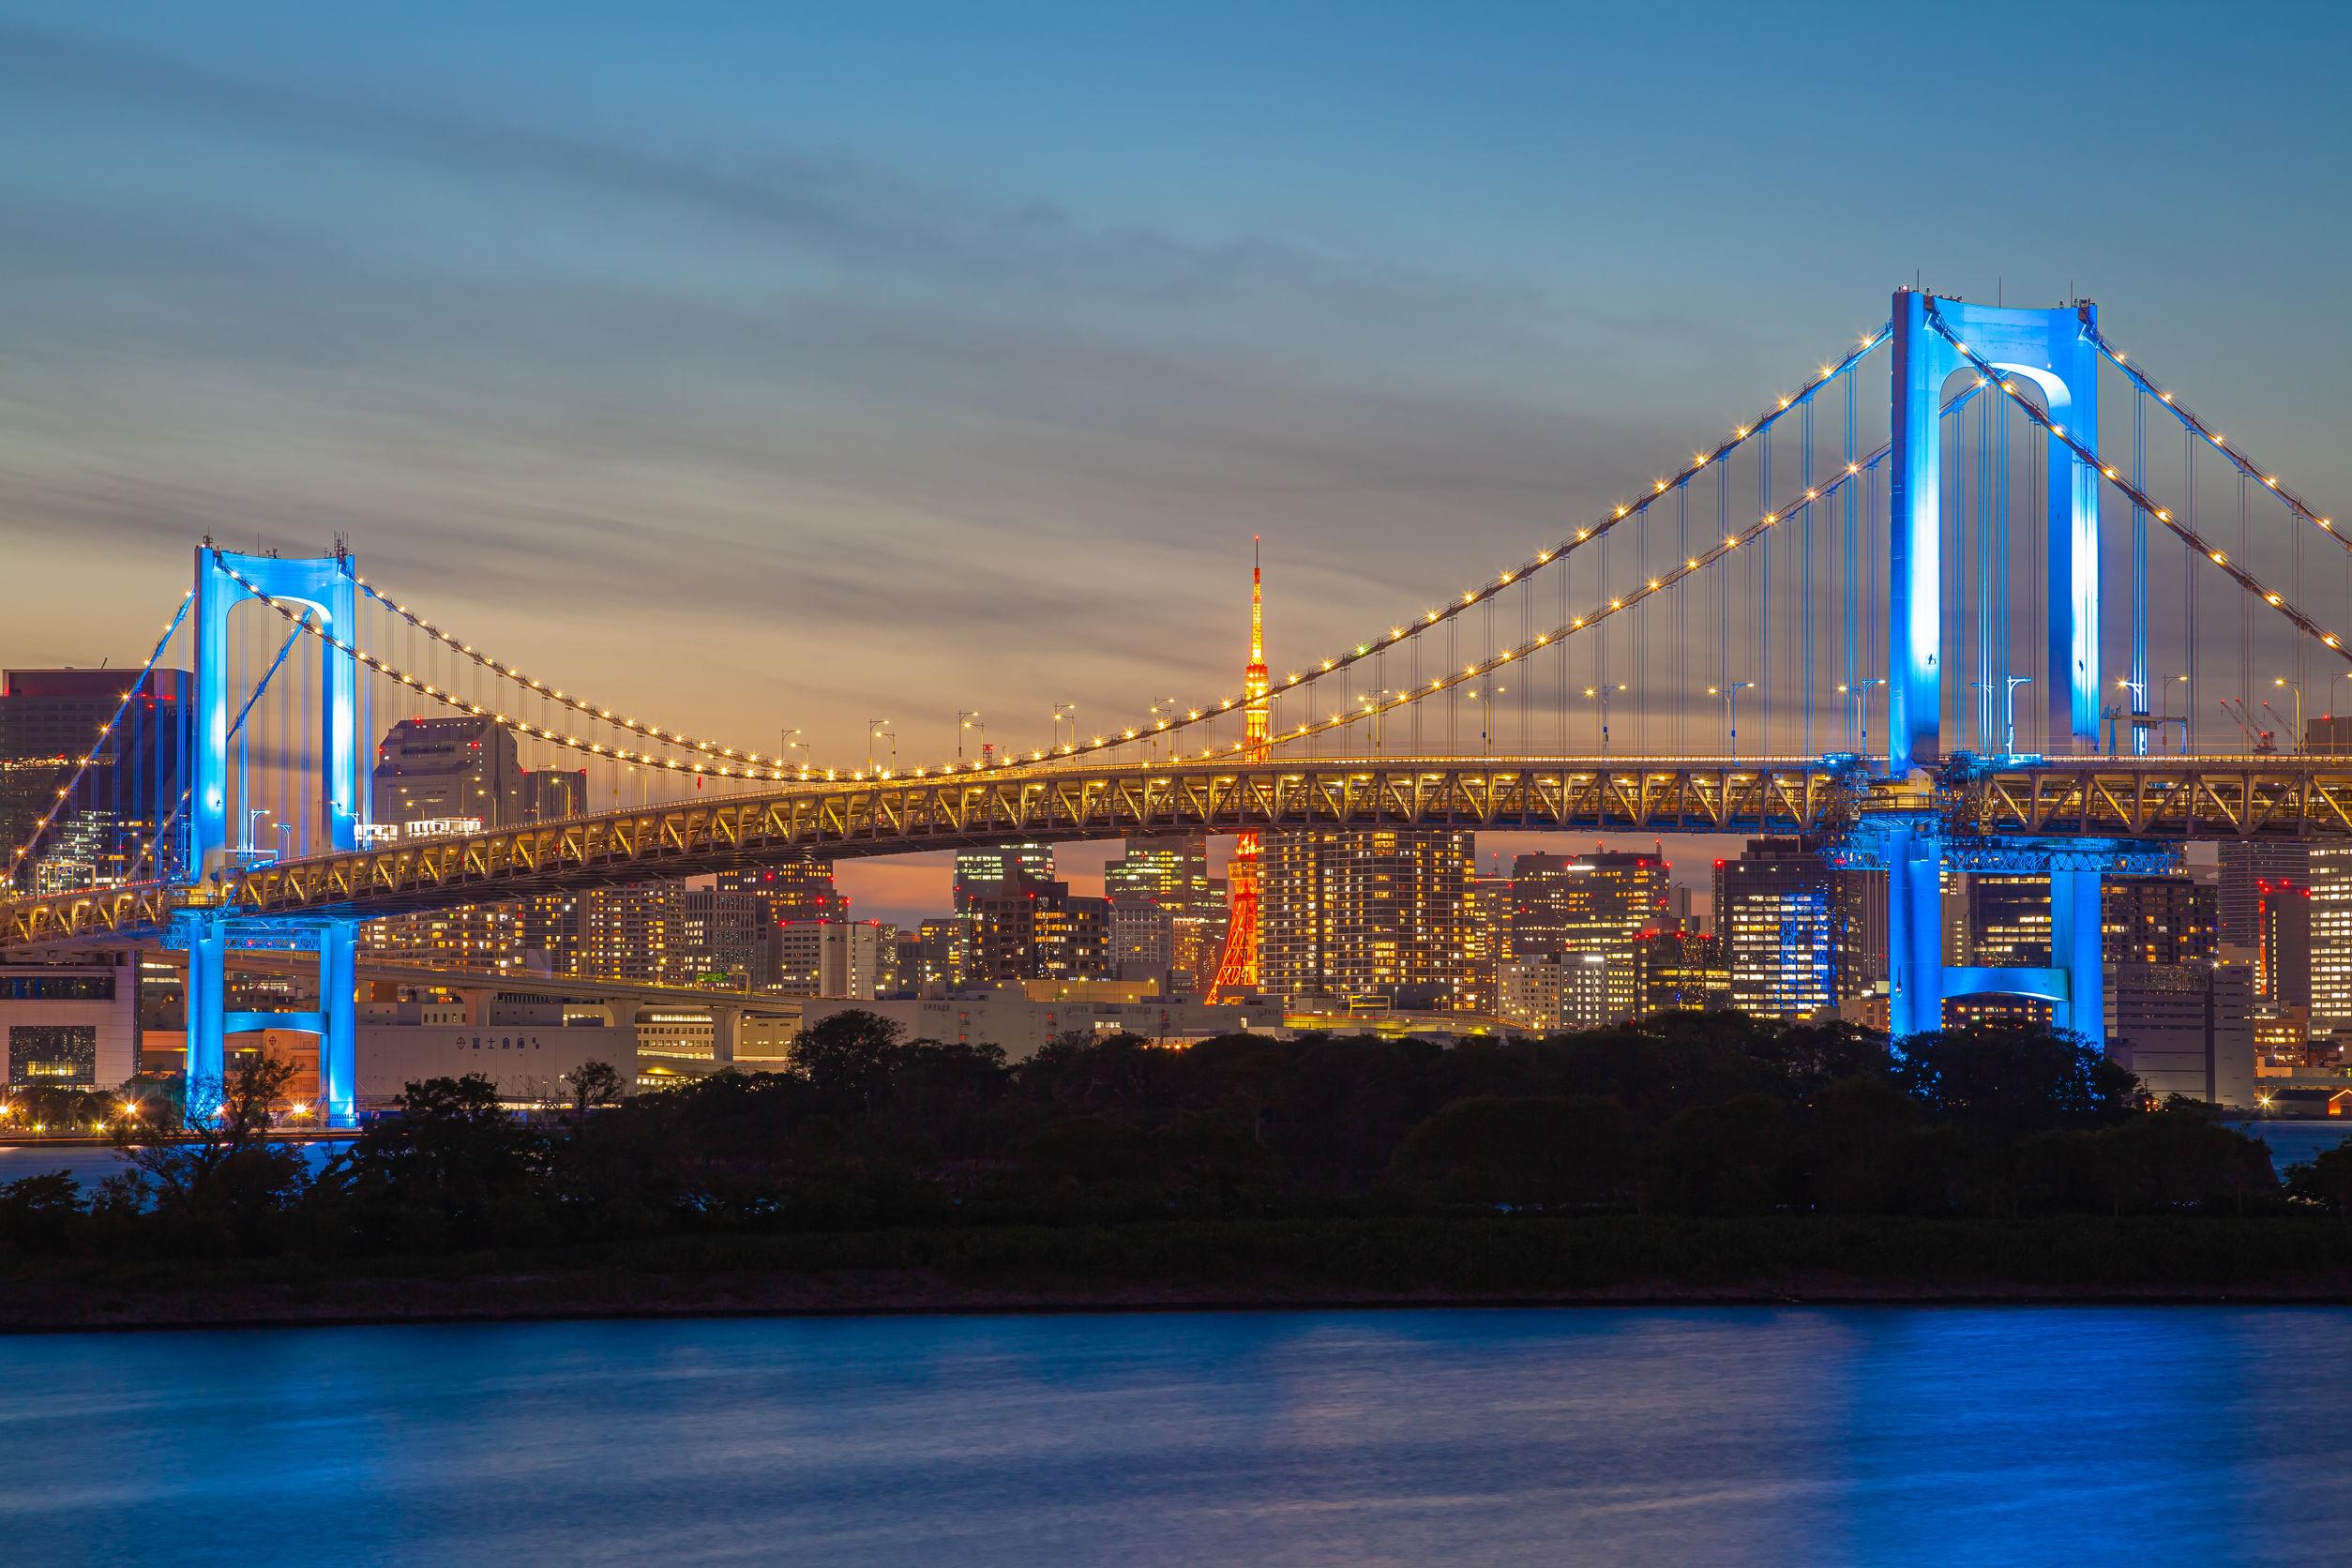 Rainbow bridge indicating the status of Covit-19 situation in Tokyo